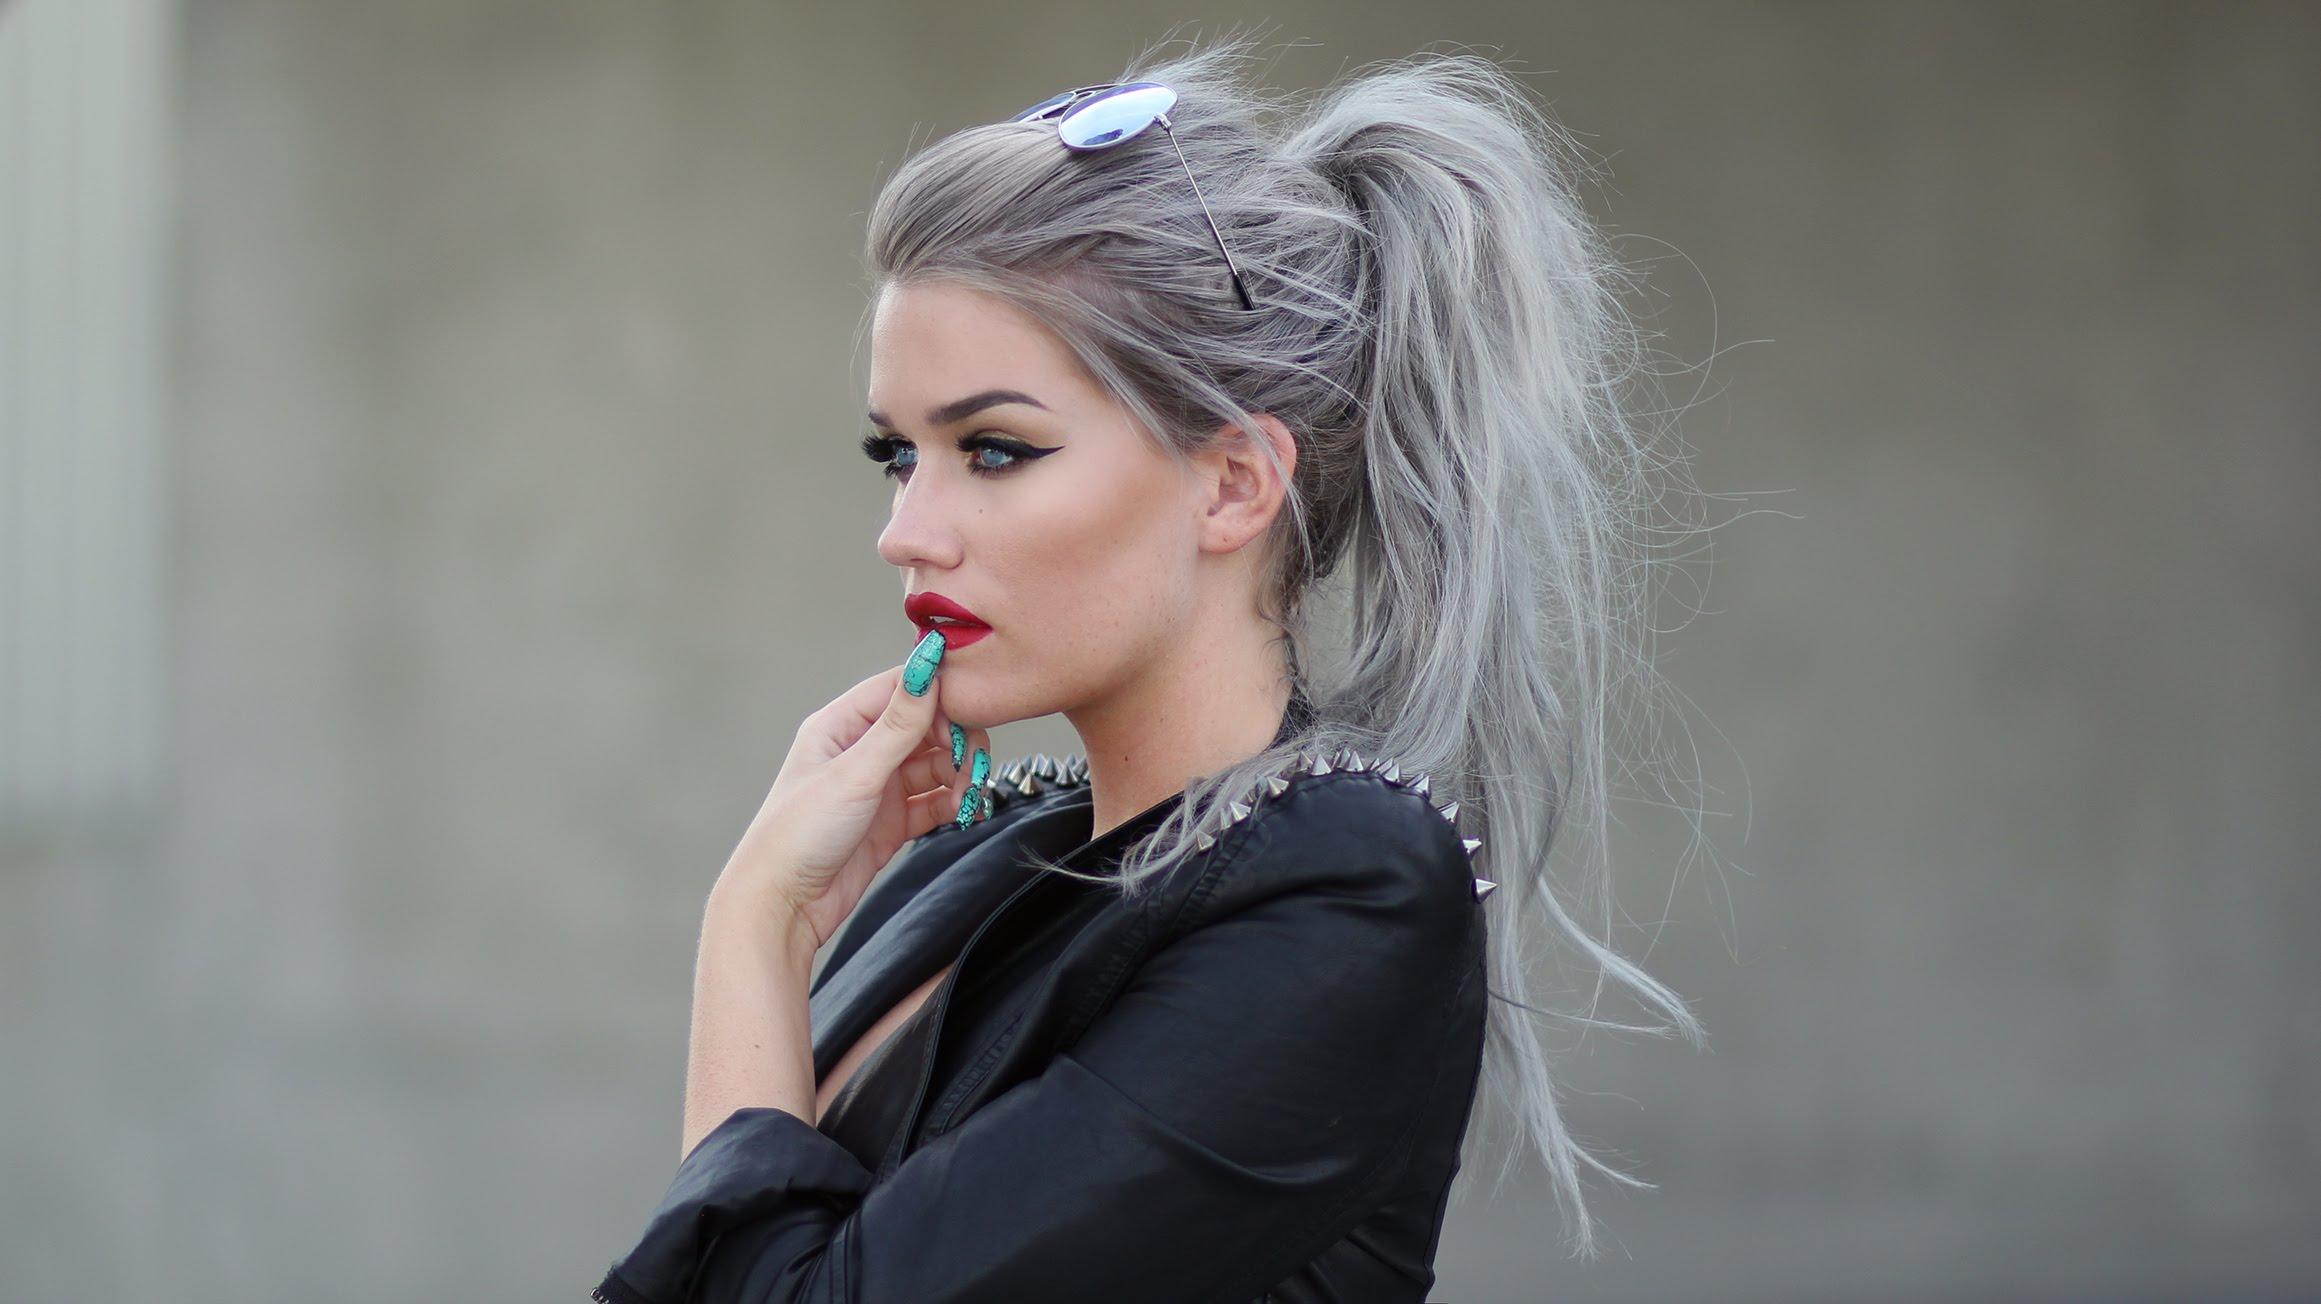 Color Hair Style: Silver Hair Dye: 30 Gorgeous Silver Hair Dye Looks